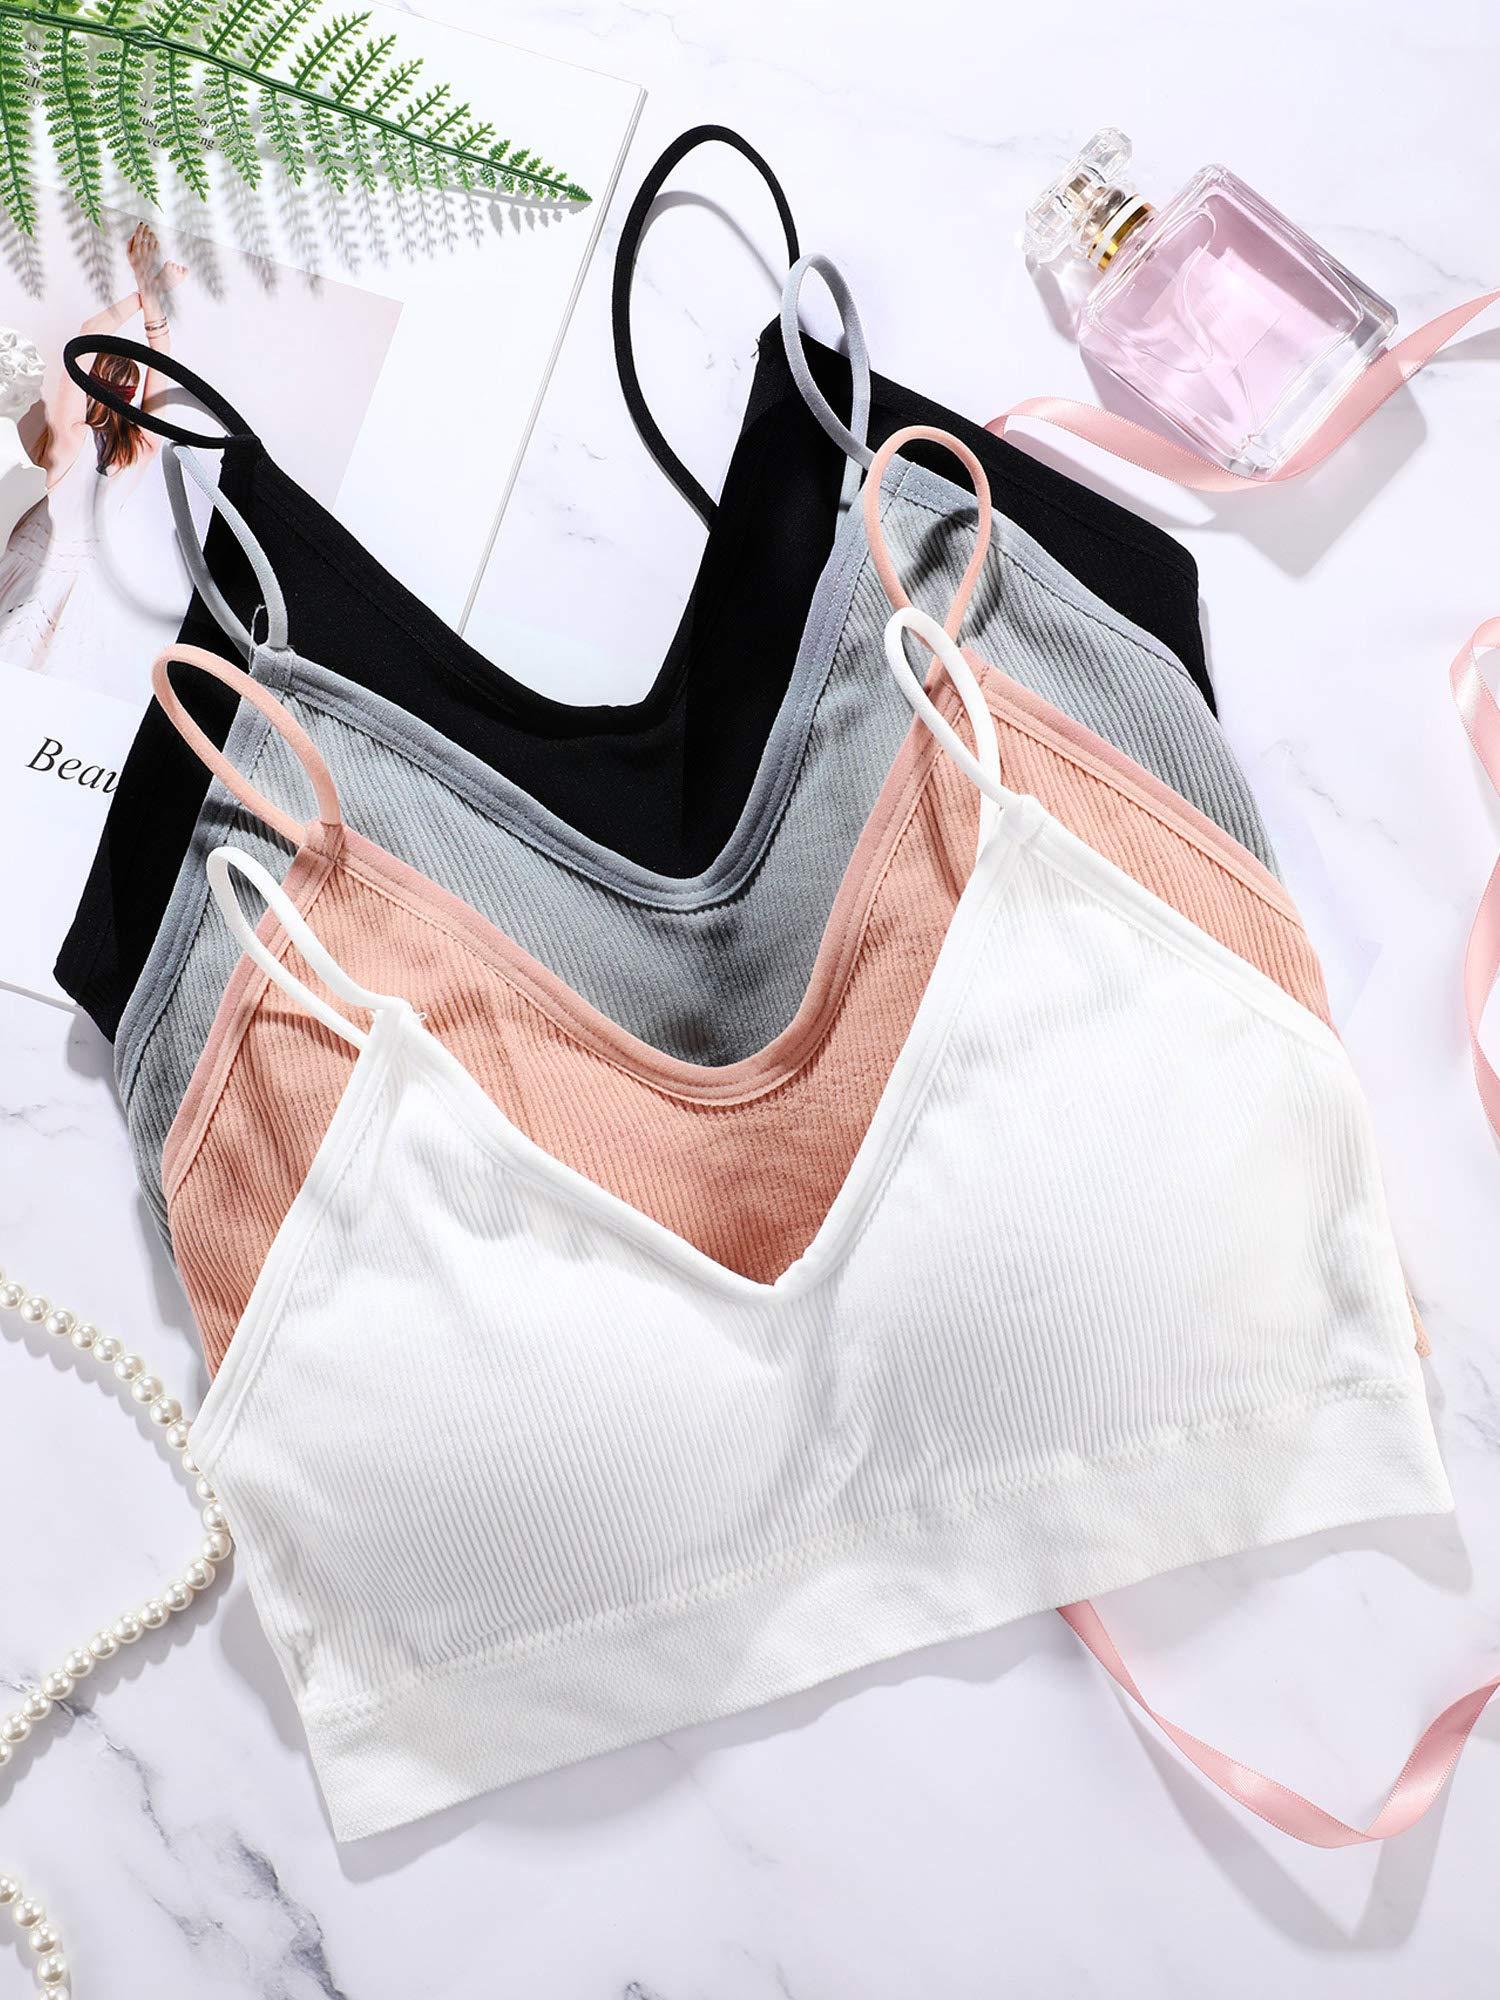 4 Pieces V Neck Cami Bra Padded Seamless Bralette Straps Sleeping Bra for Women Girls